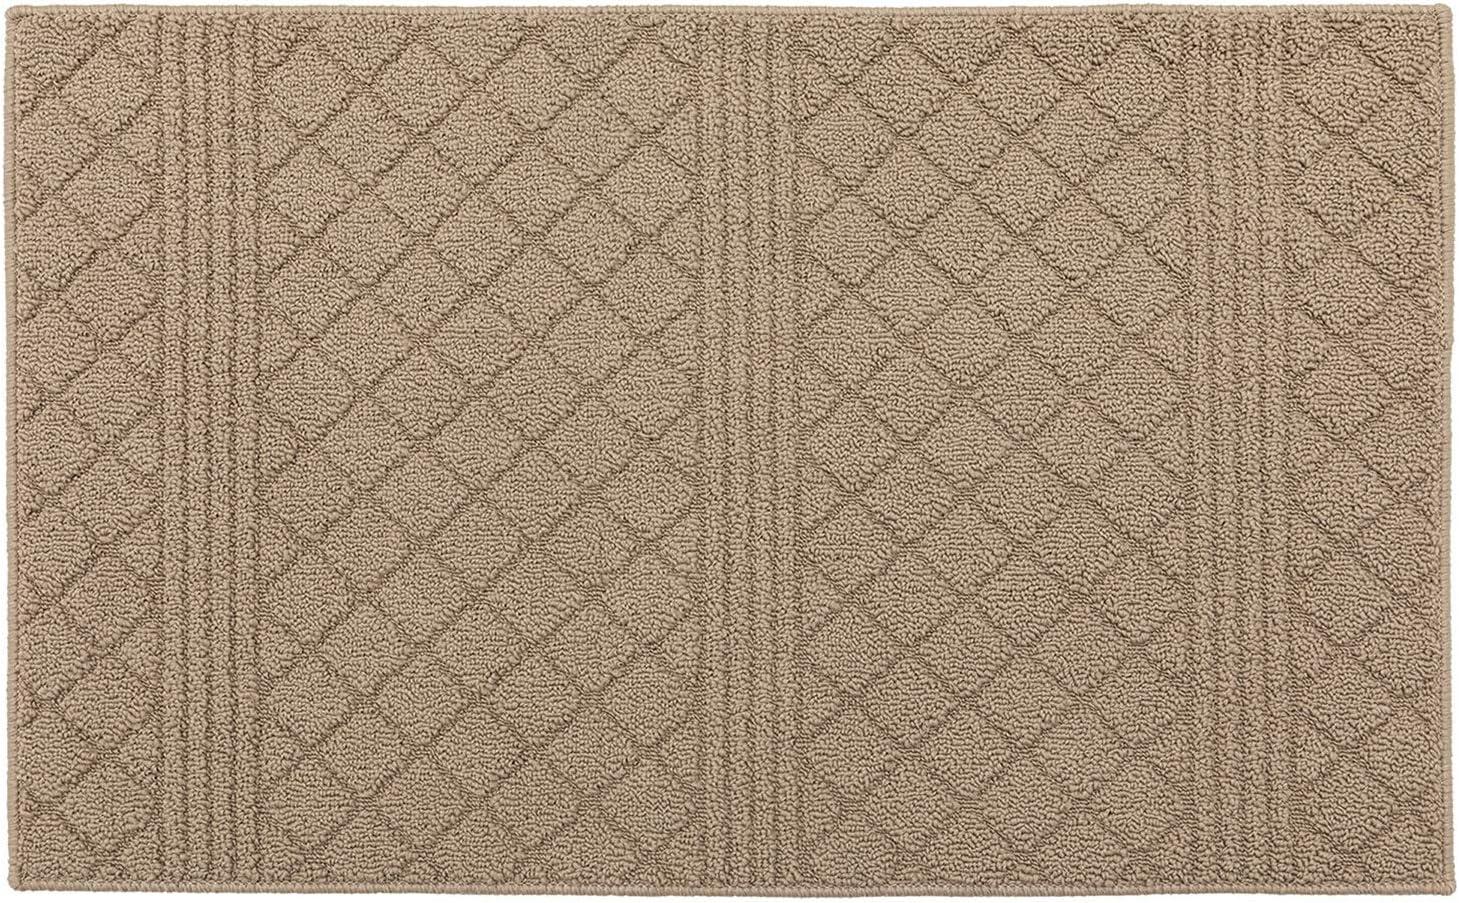 "Indoor Doormat Front Door Mat Non Slip Rubber Backing Super Absorbent Mud and Snow Magic Dirts Trapper Mats Entrance Door Rug Shoes Mat Machine Washable Carpet - Beige, 20"" x 32"""